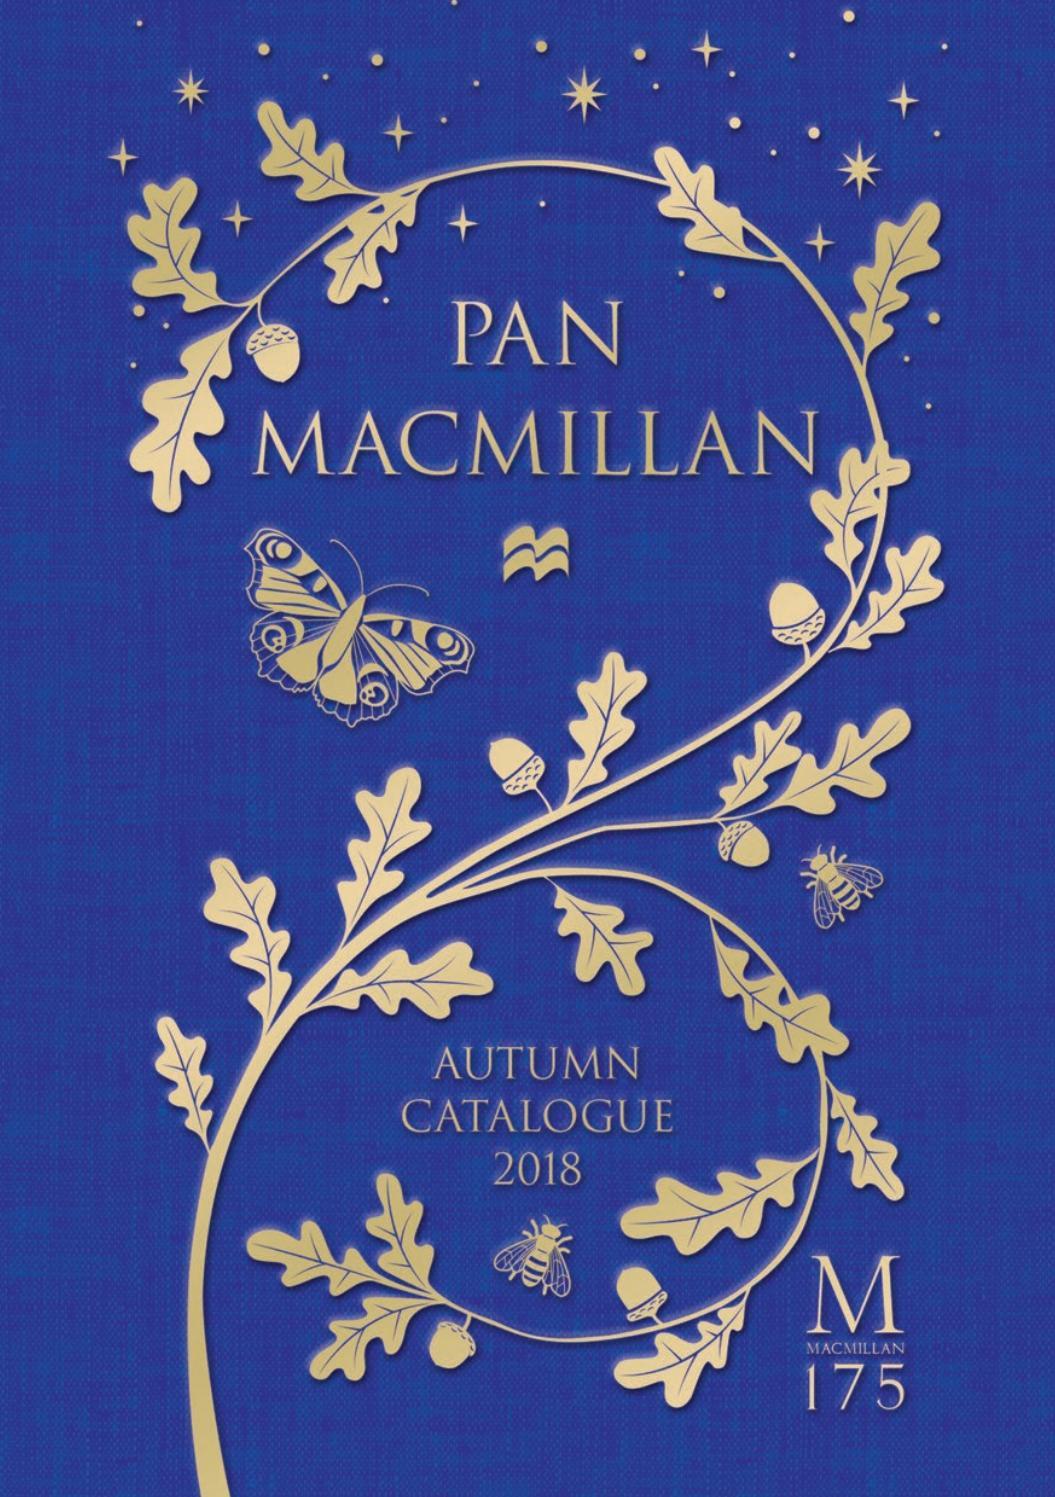 Pan Macmillan Autumn catalogue 2018 by James Luscombe - issuu